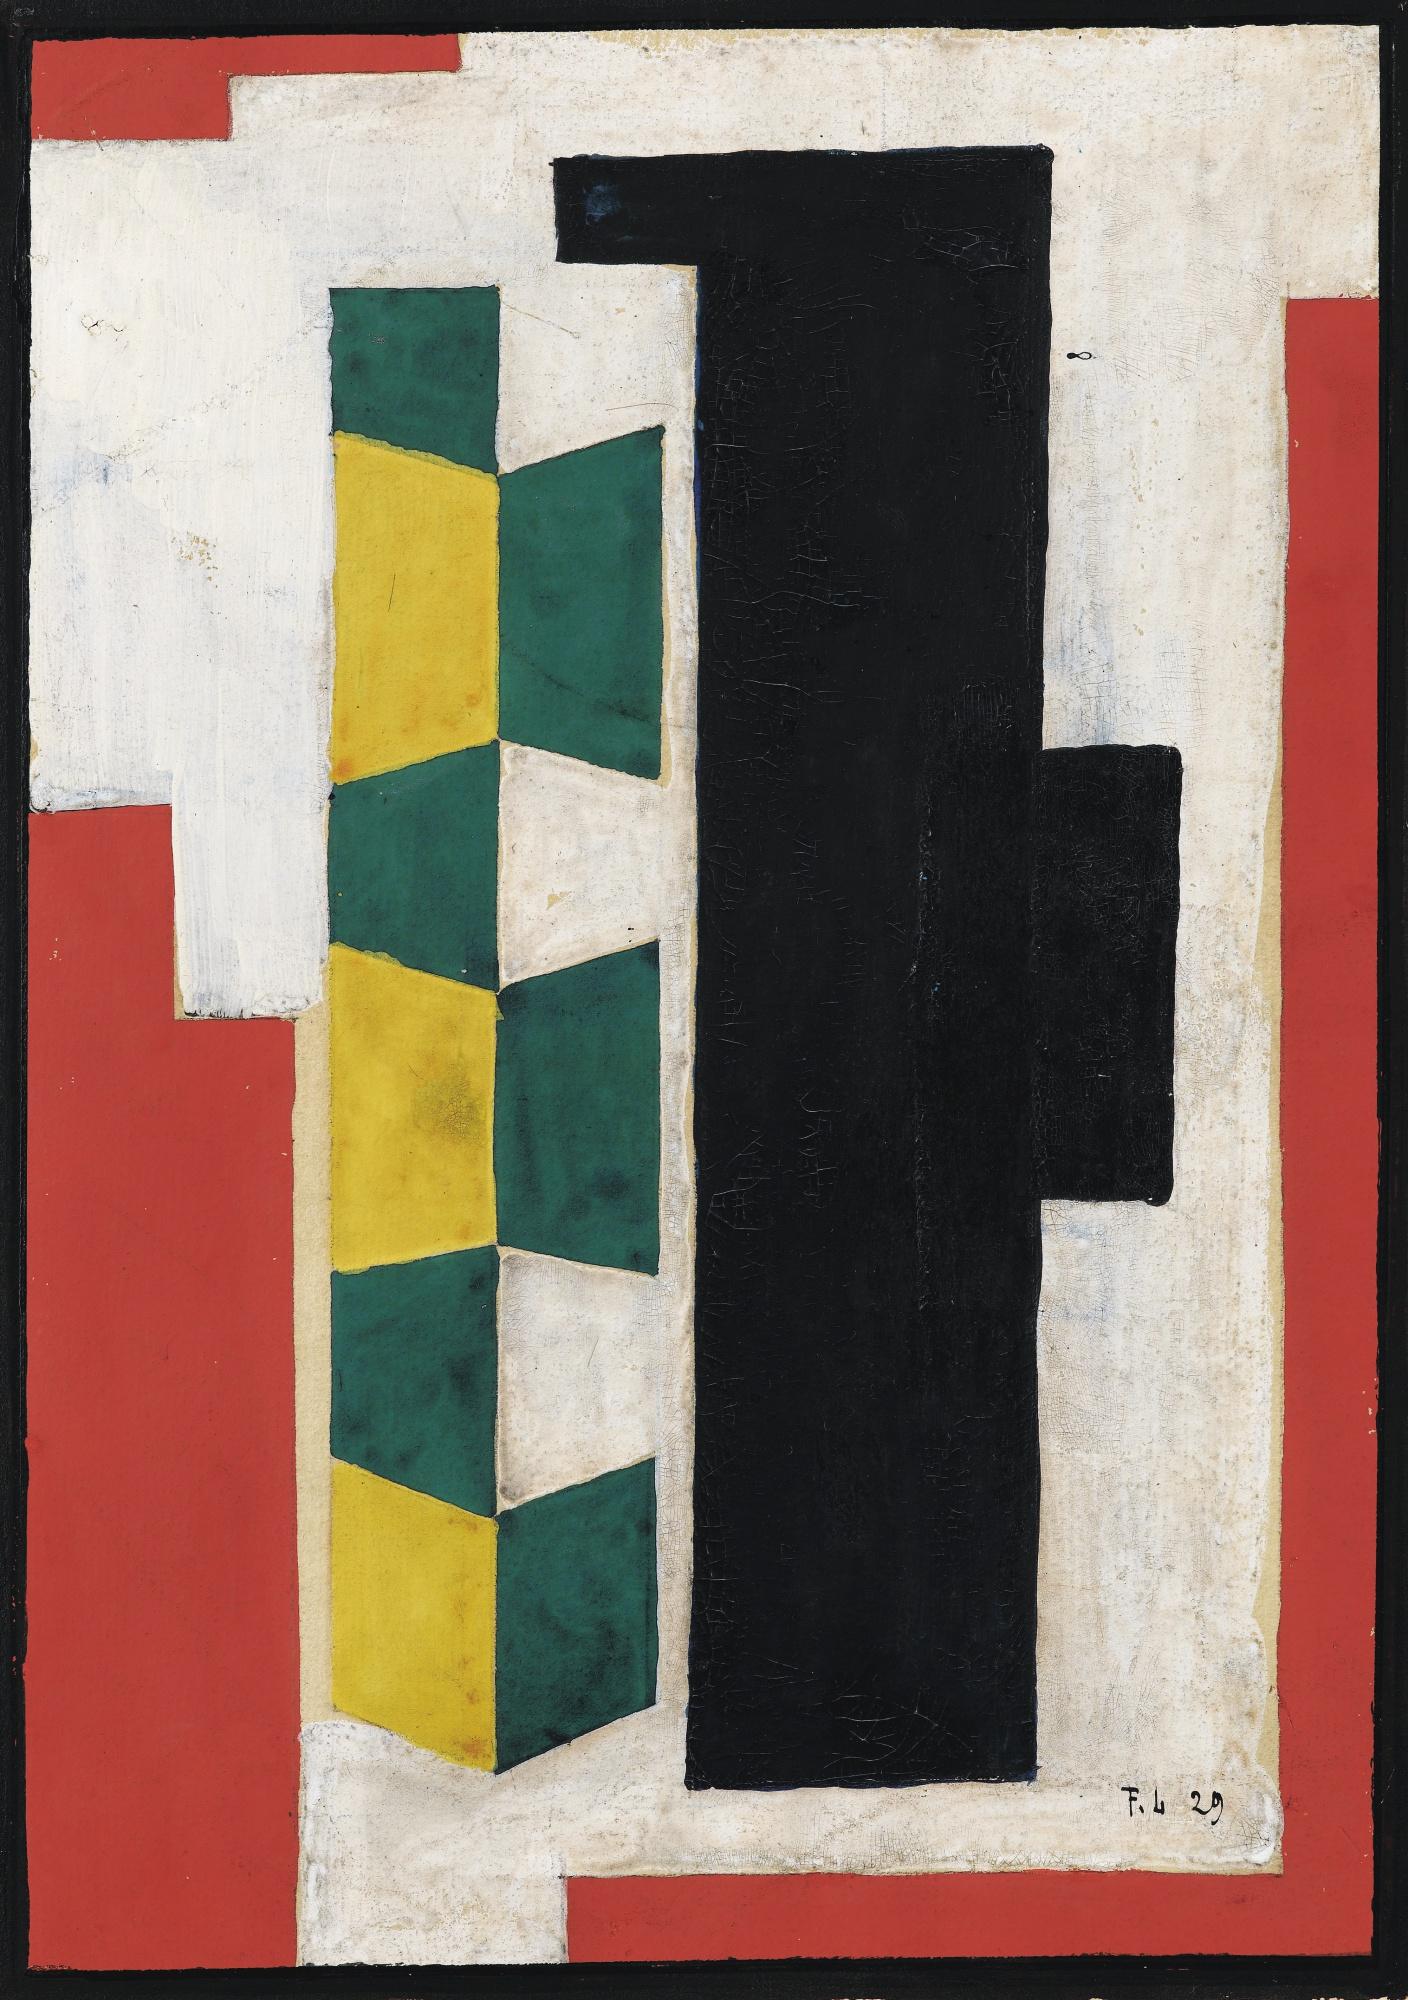 Fernand Leger-Composition Murale-1929